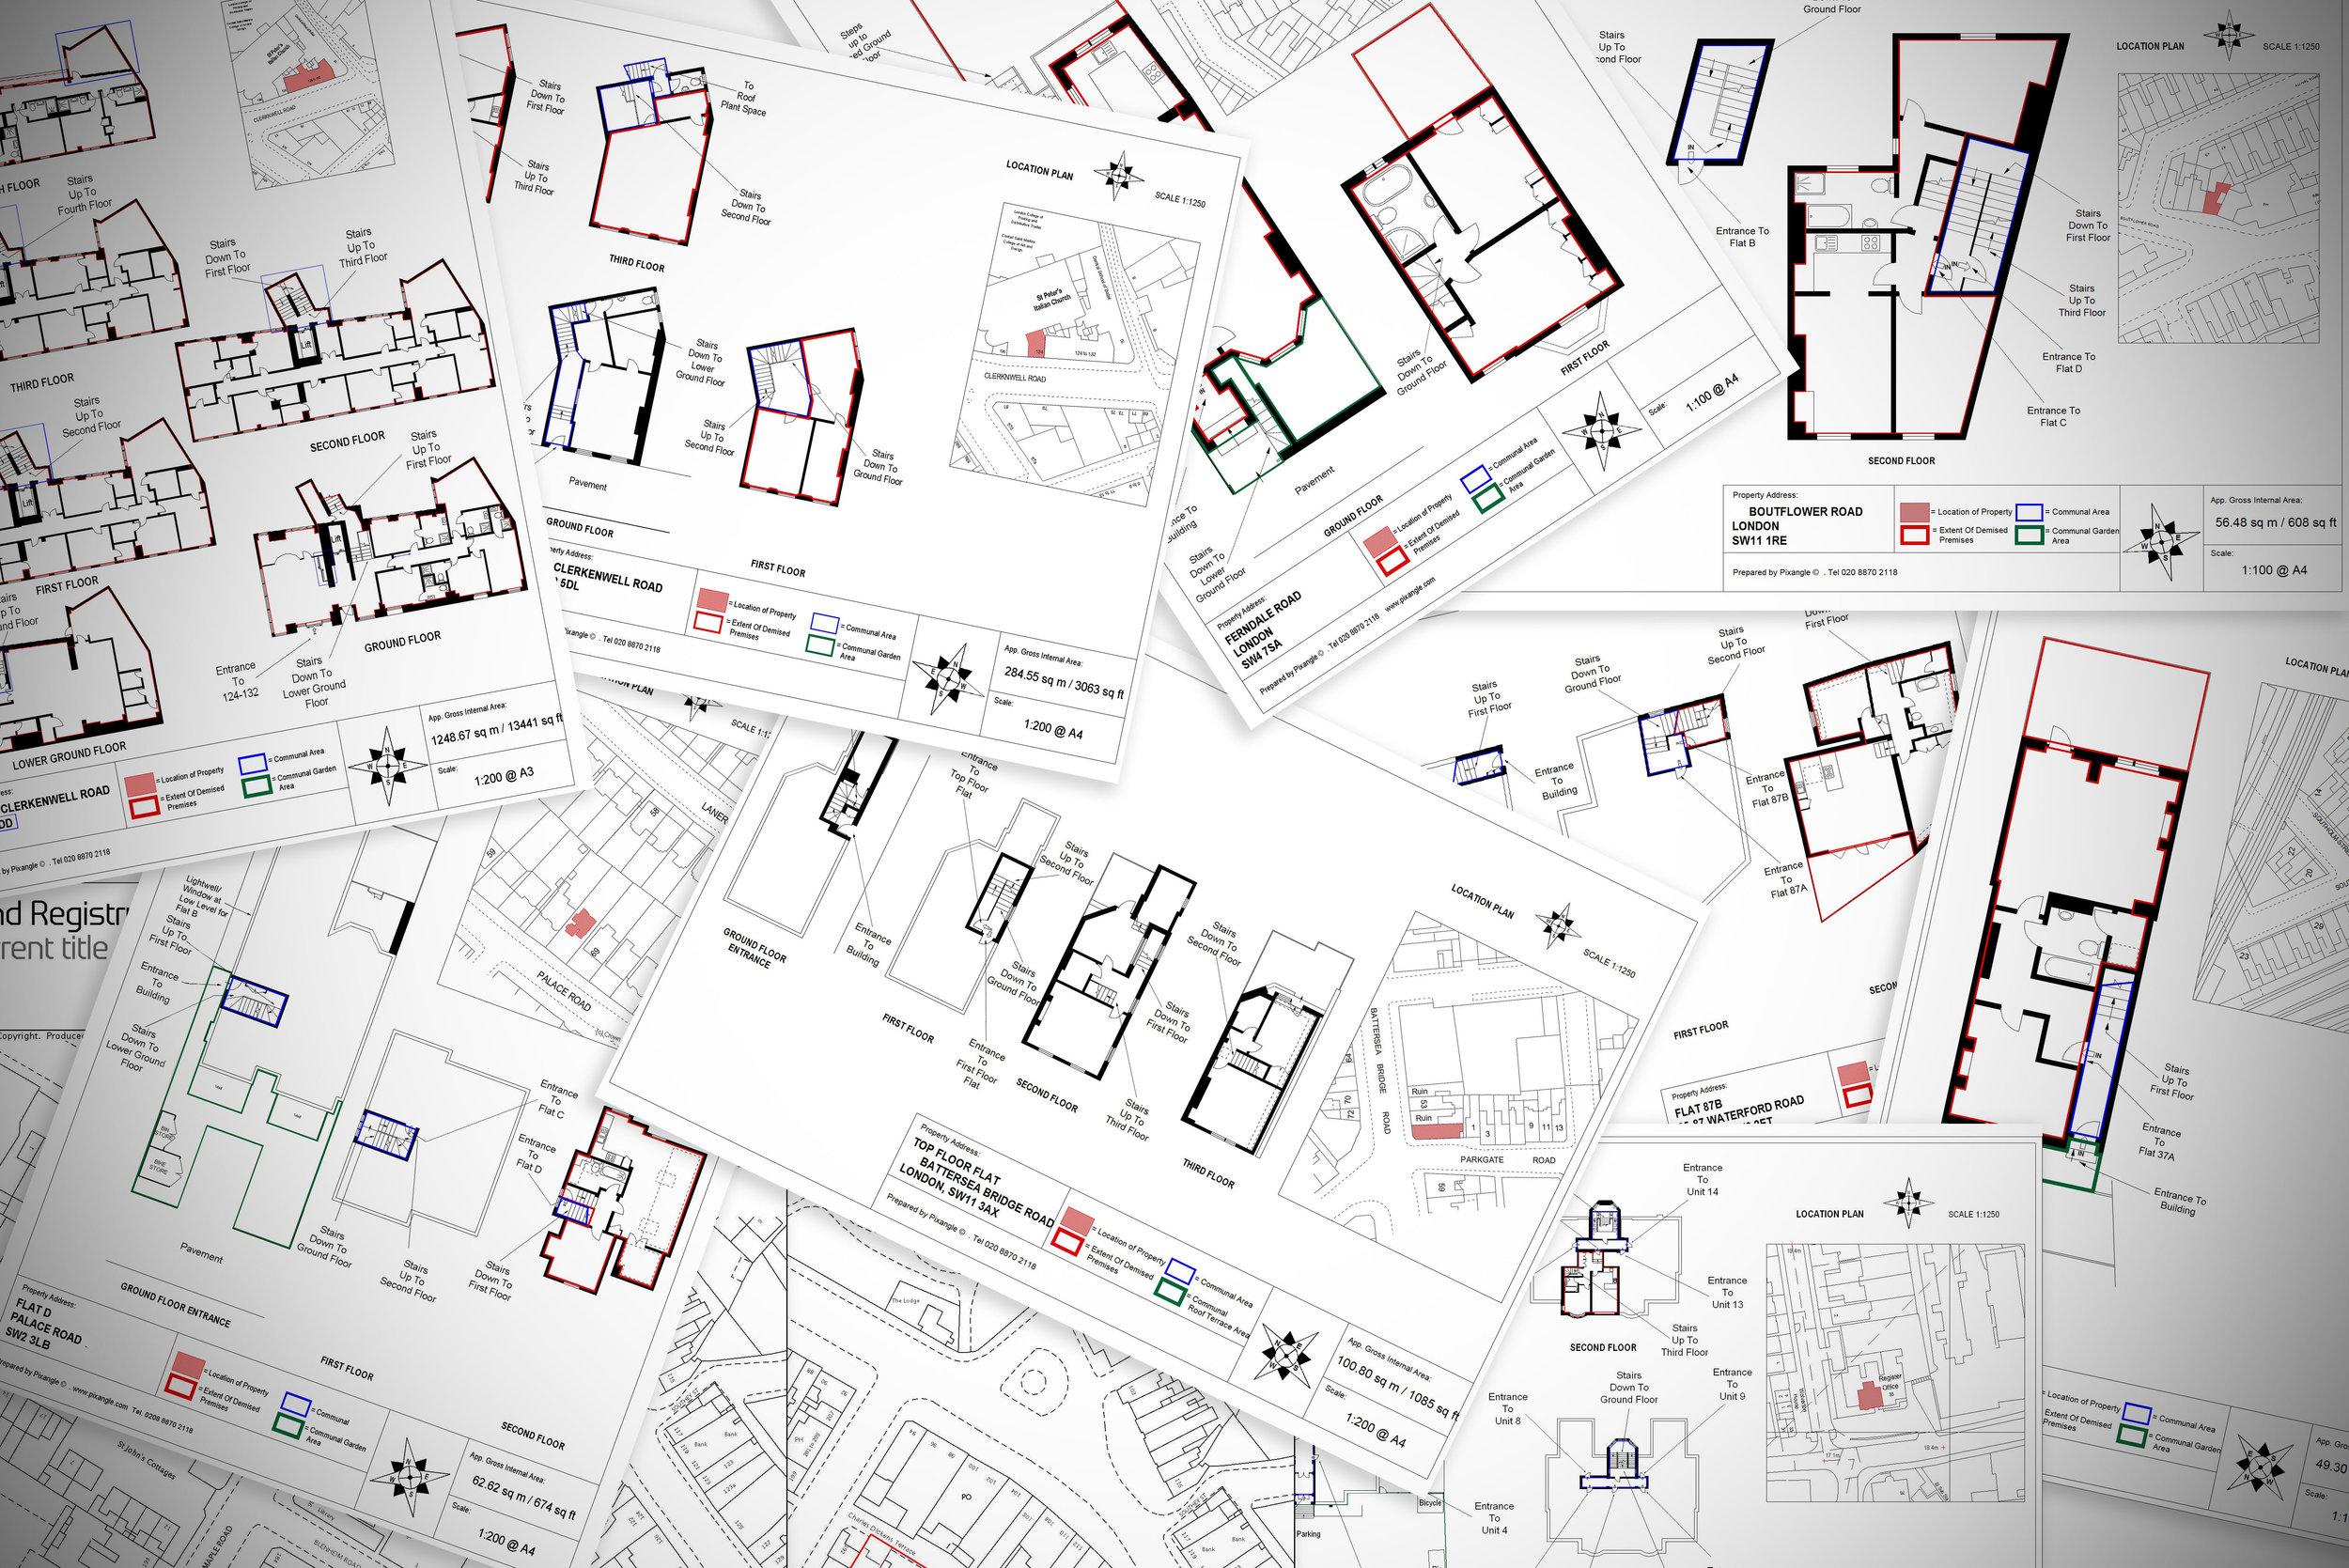 Lease plan drawing